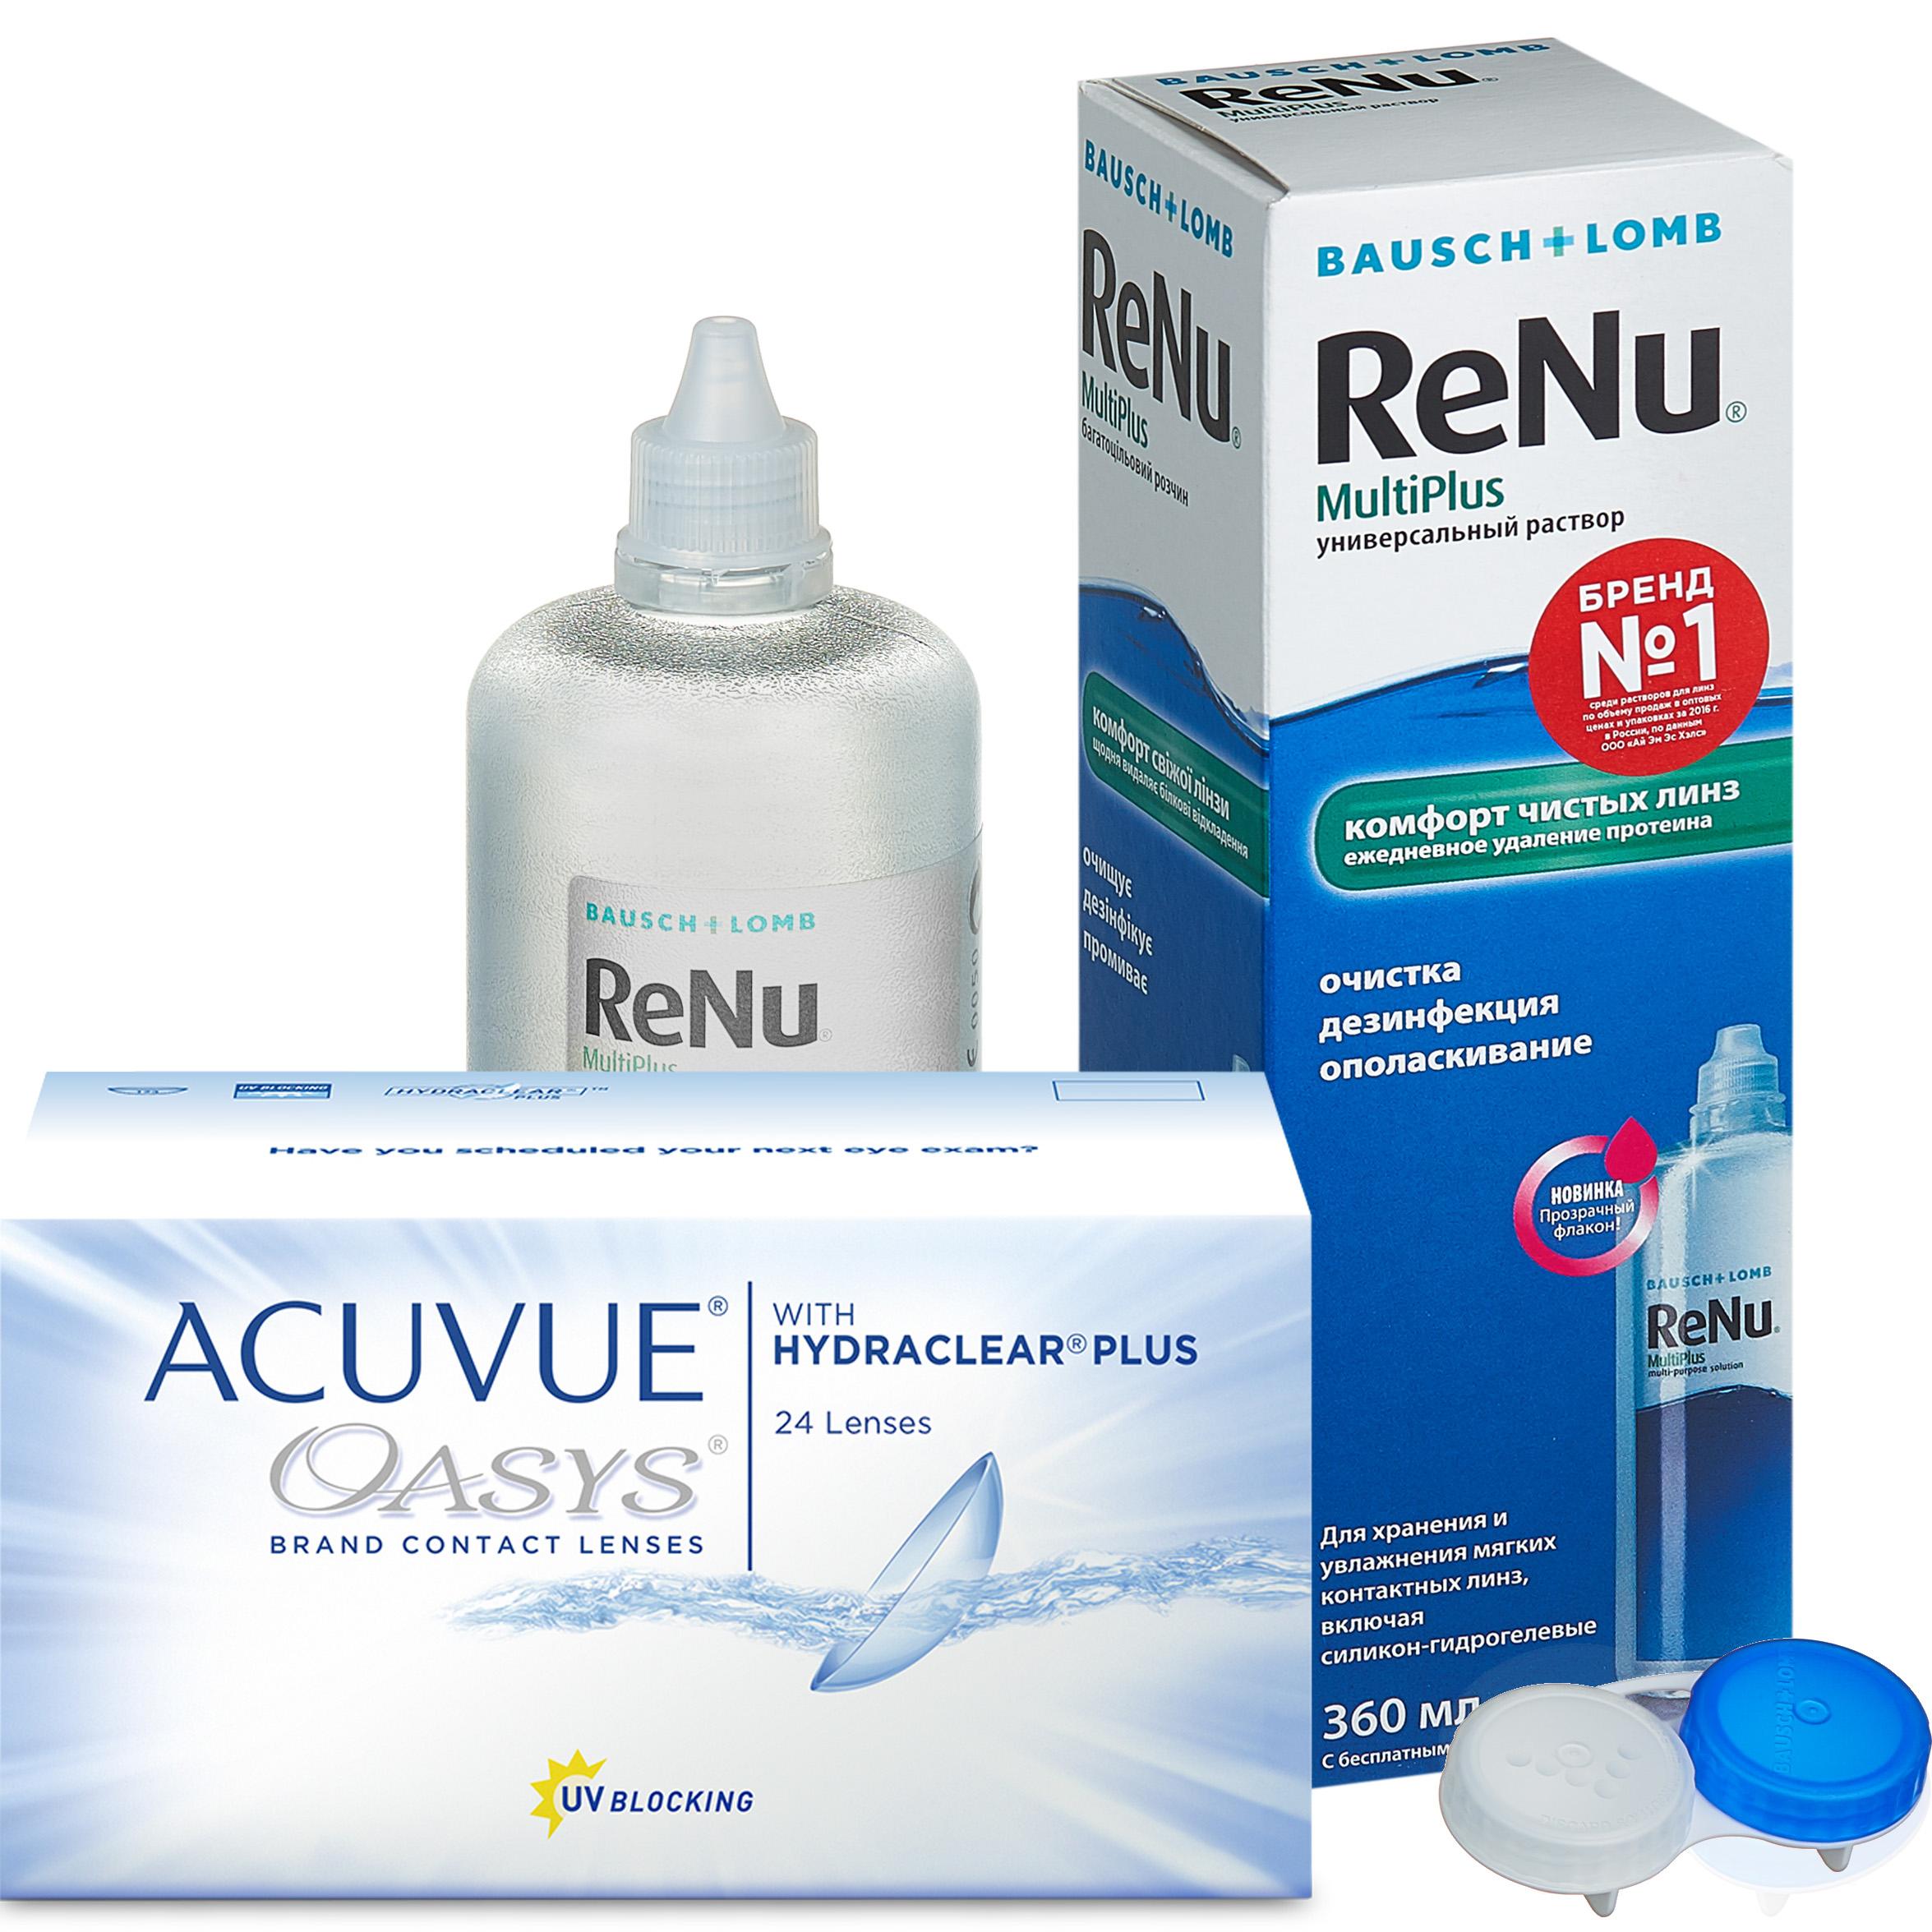 Купить Oasys with Hydraclear Plus 24 линзы + ReNu MultiPlus, Линзы Acuvue Oasys with Hydraclear Plus 24 линзы R 8.8 +0, 50 + ReNu Multi Plus 360 мл